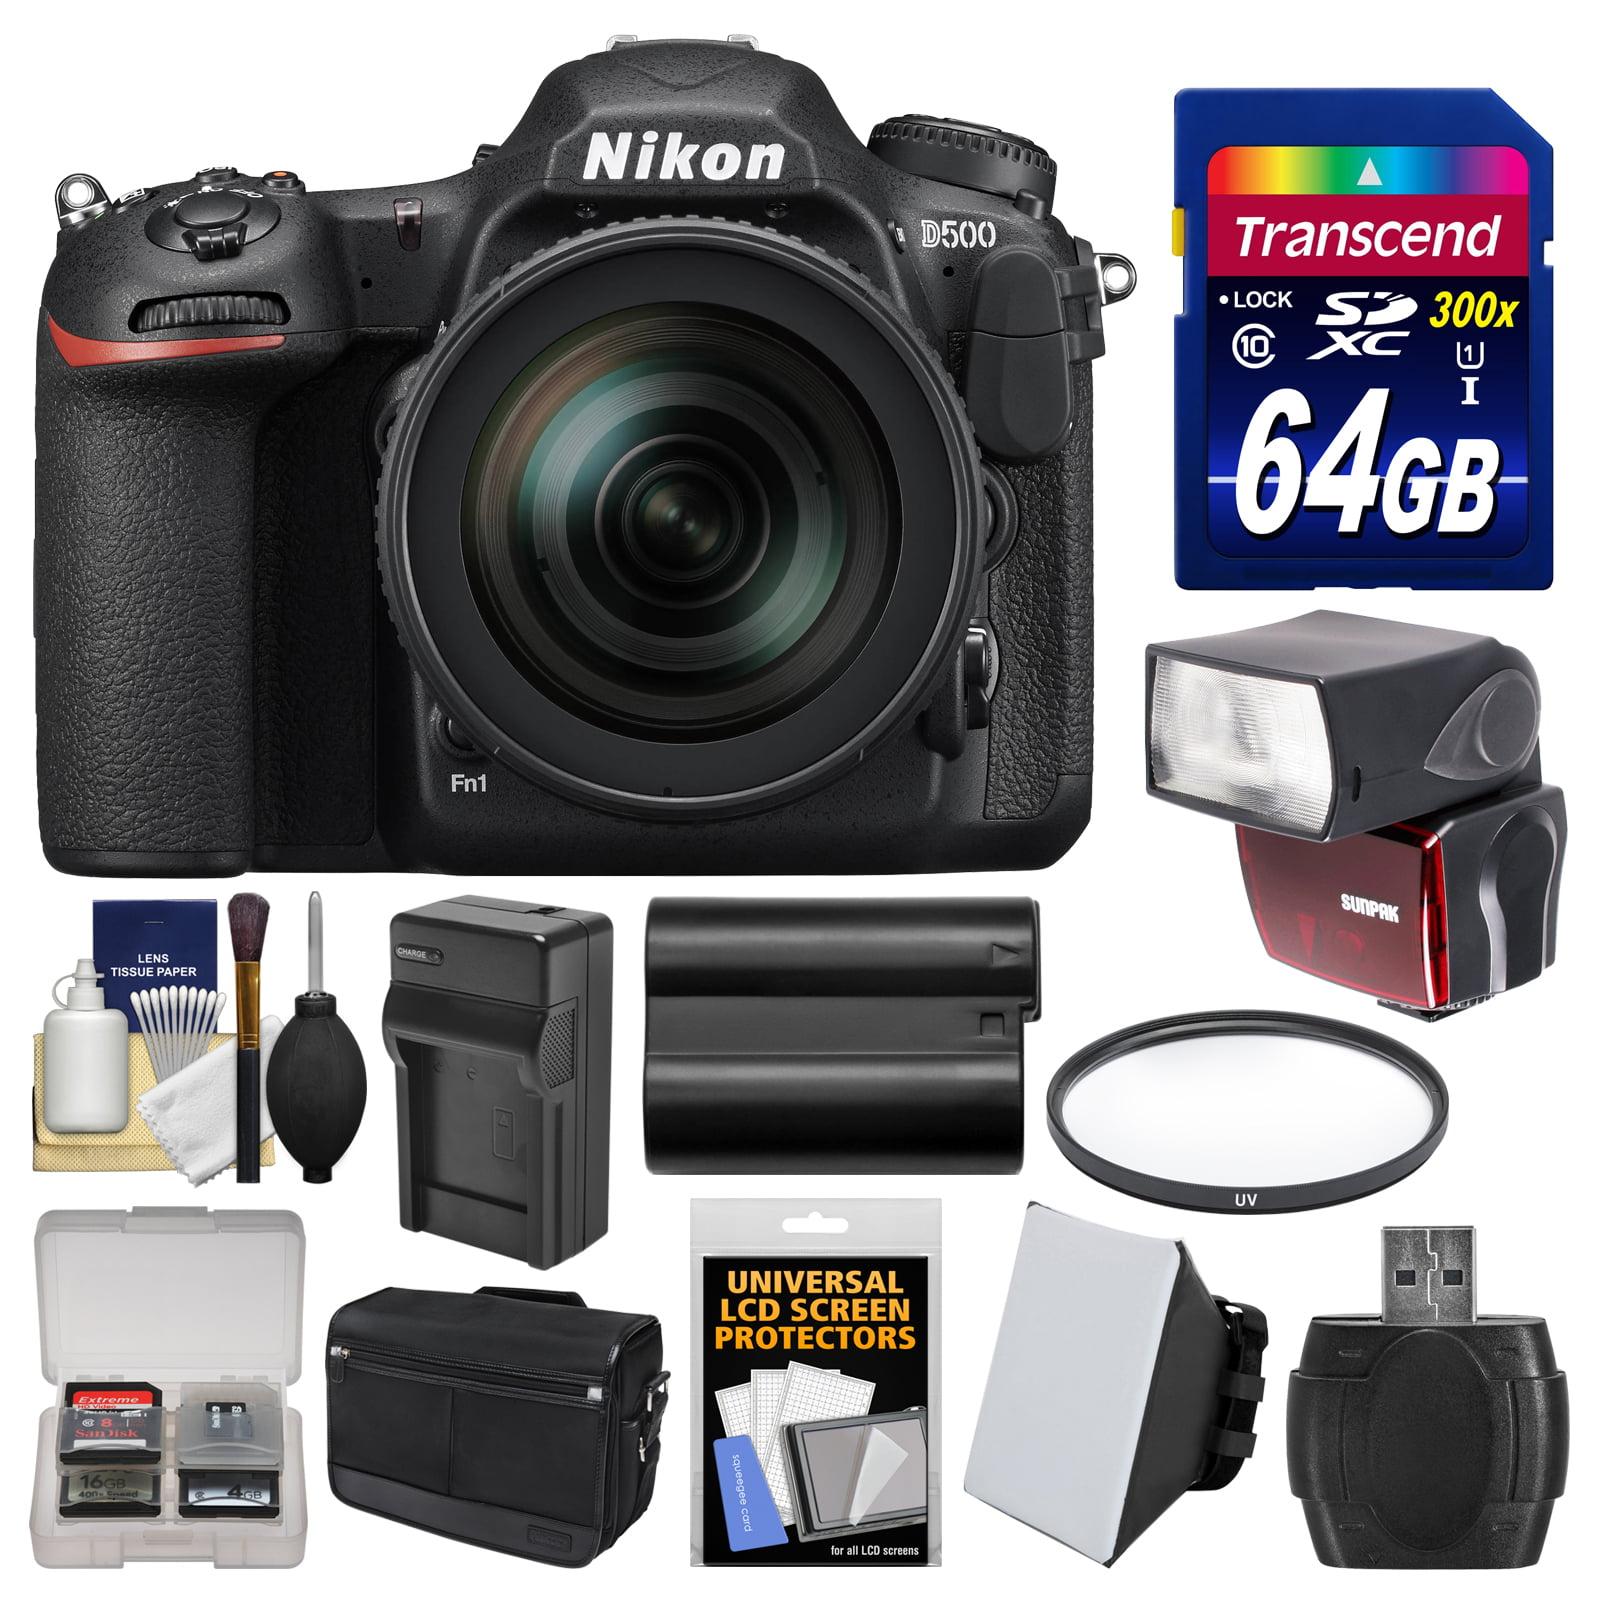 Nikon D500 Wi-Fi 4K Digital SLR Camera & 16-80mm VR Lens with 64GB Card + Case + Flash + Battery & Charger +... by Nikon